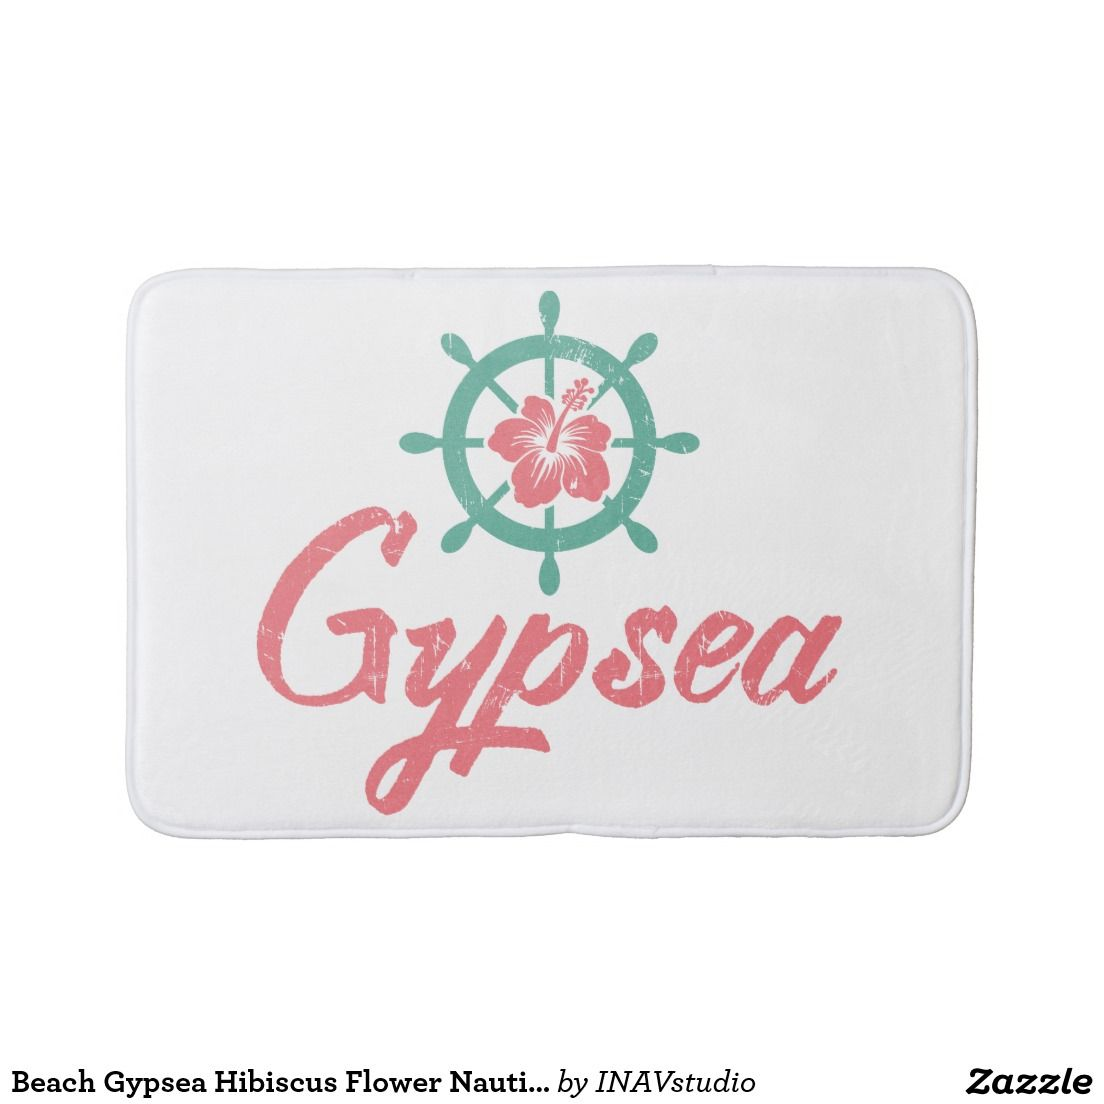 Beach Gypsea Hibiscus Flower Nautical Ship's Wheel Bathroom Mat